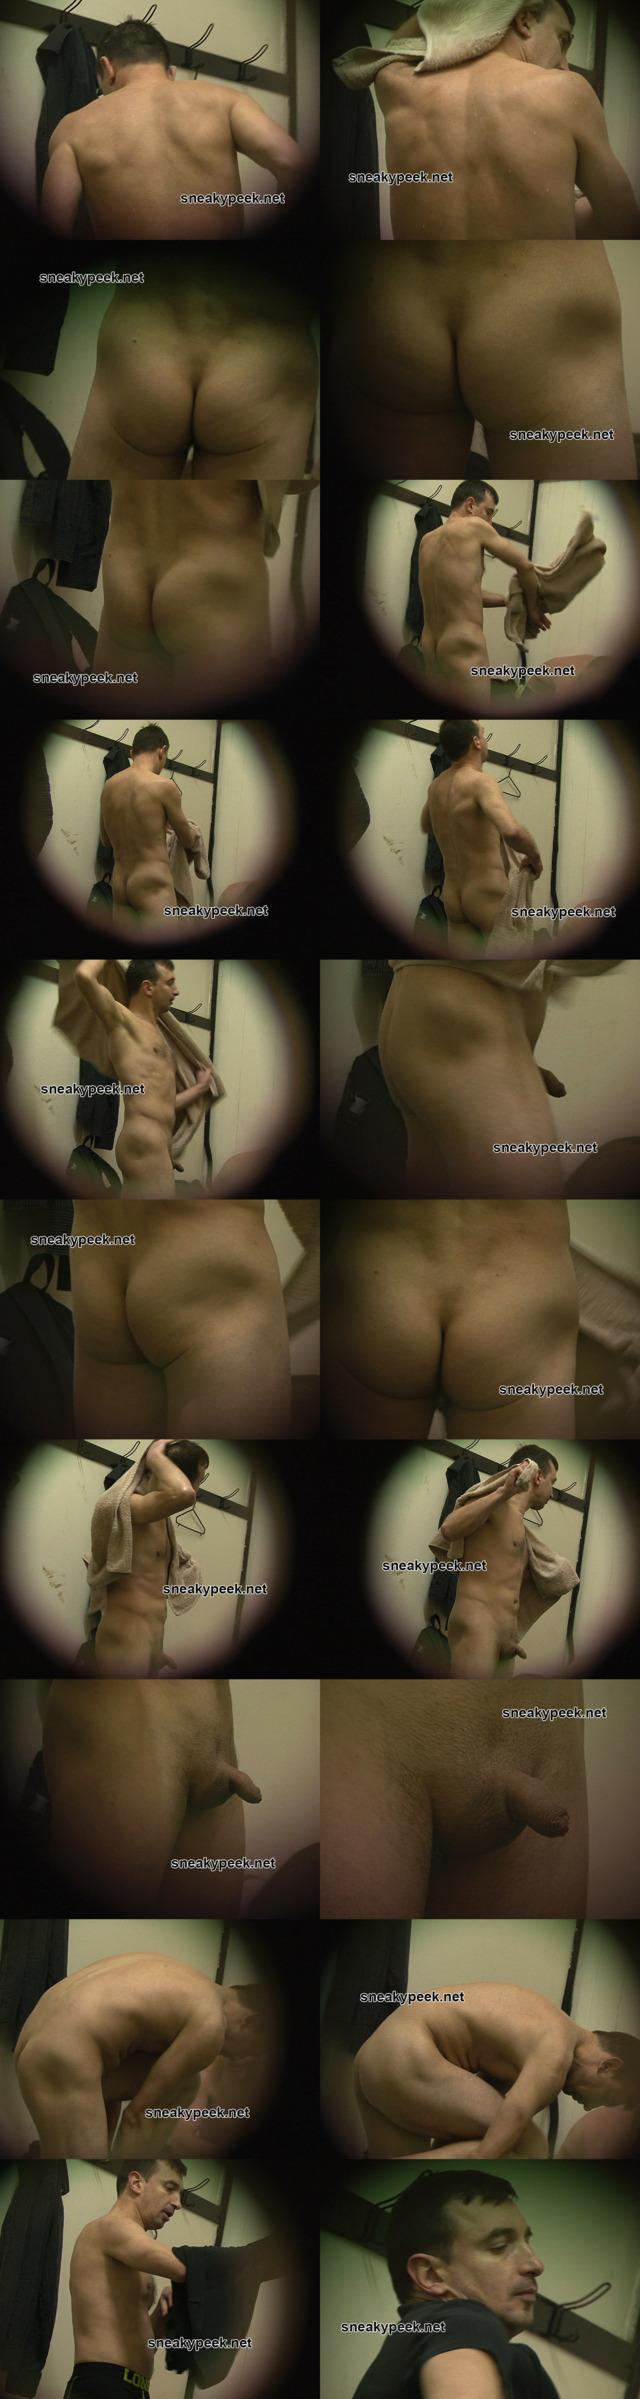 spy-on-naked-guy-after-shower